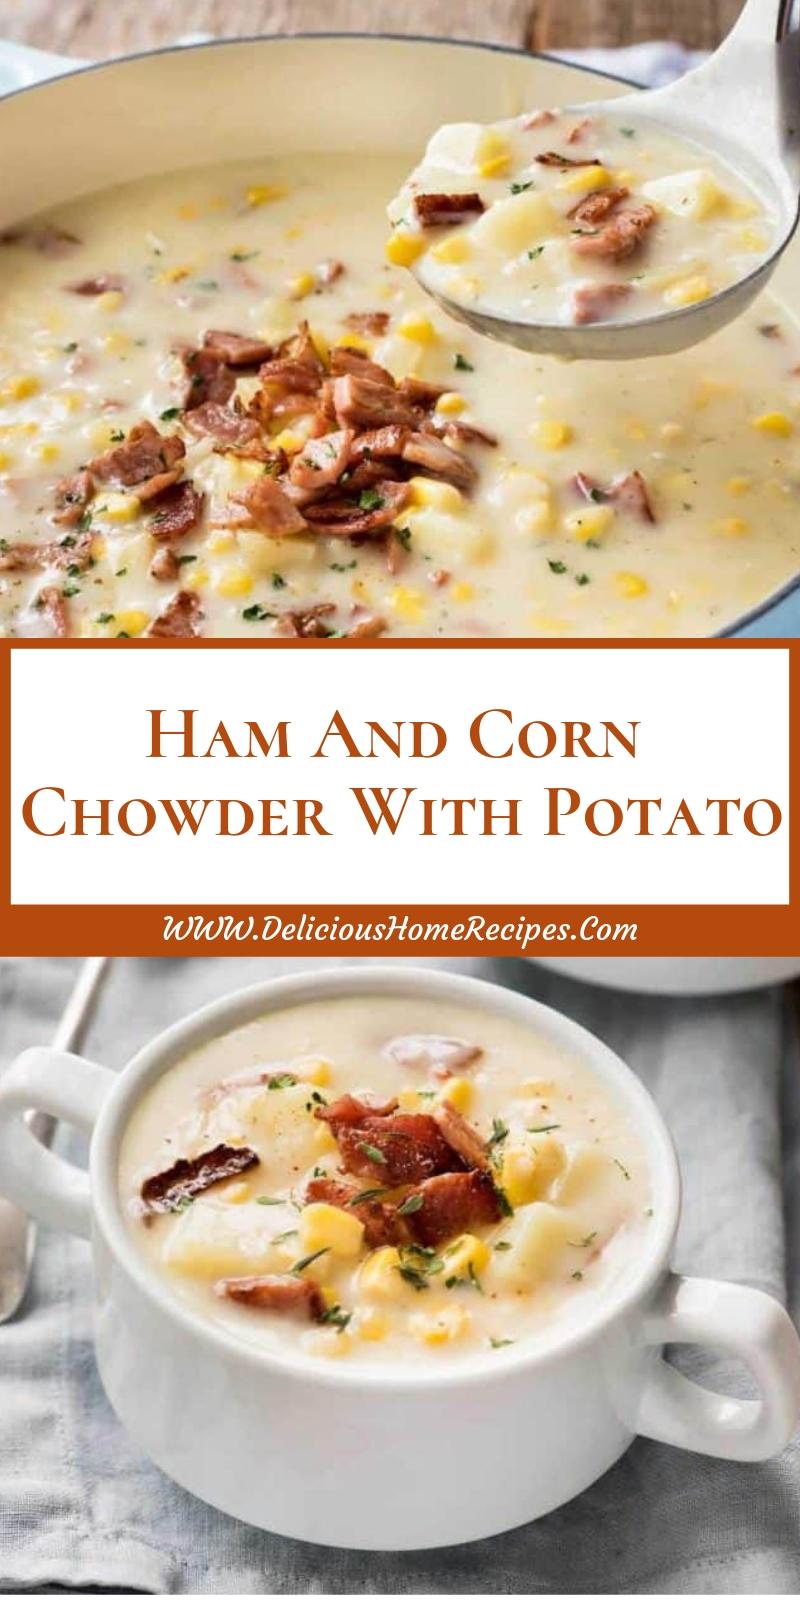 Ham And Corn Chowder With Potato